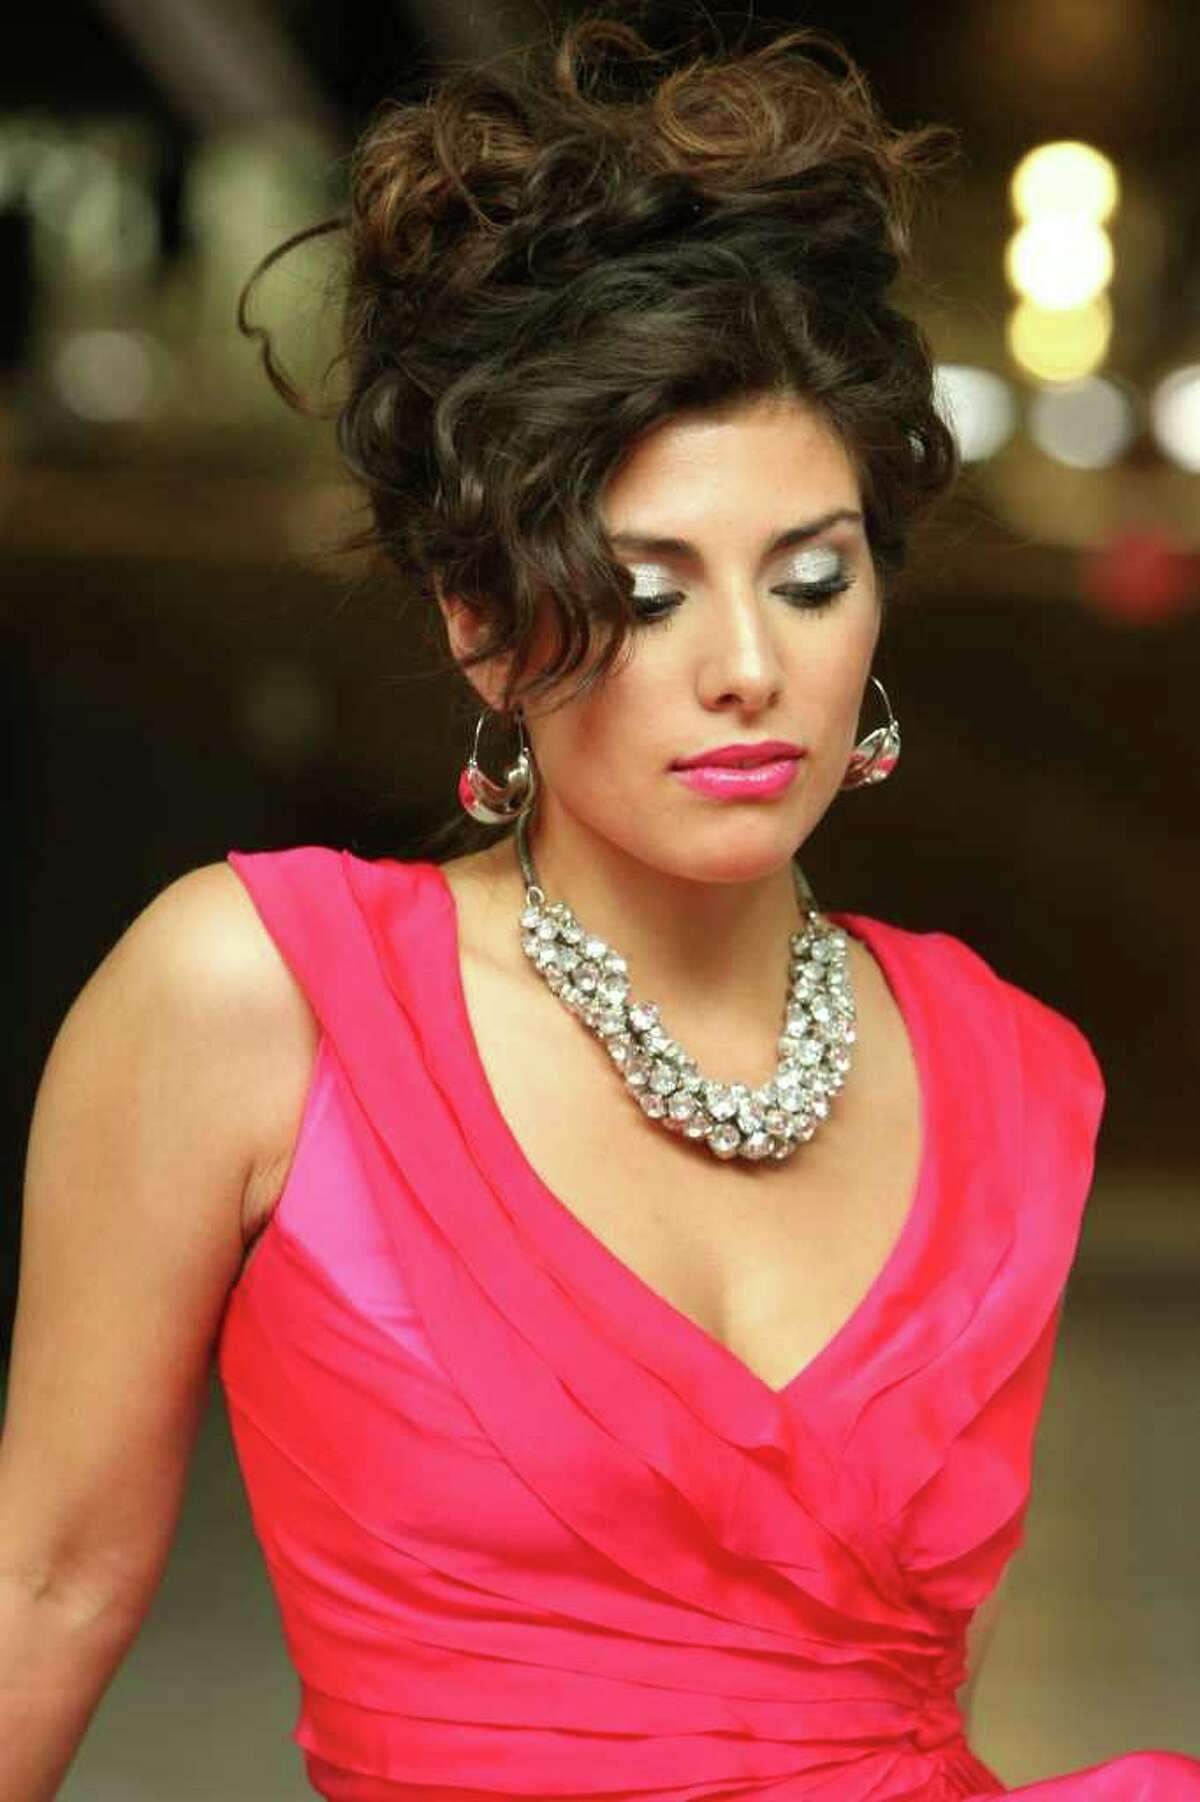 CONEXION: Christina Garcia, 2010 Hottest Latina contest winner. Photographed Sunday May 17, 2010. HELEN L. MONTOYA/hmontoya@express-news.net